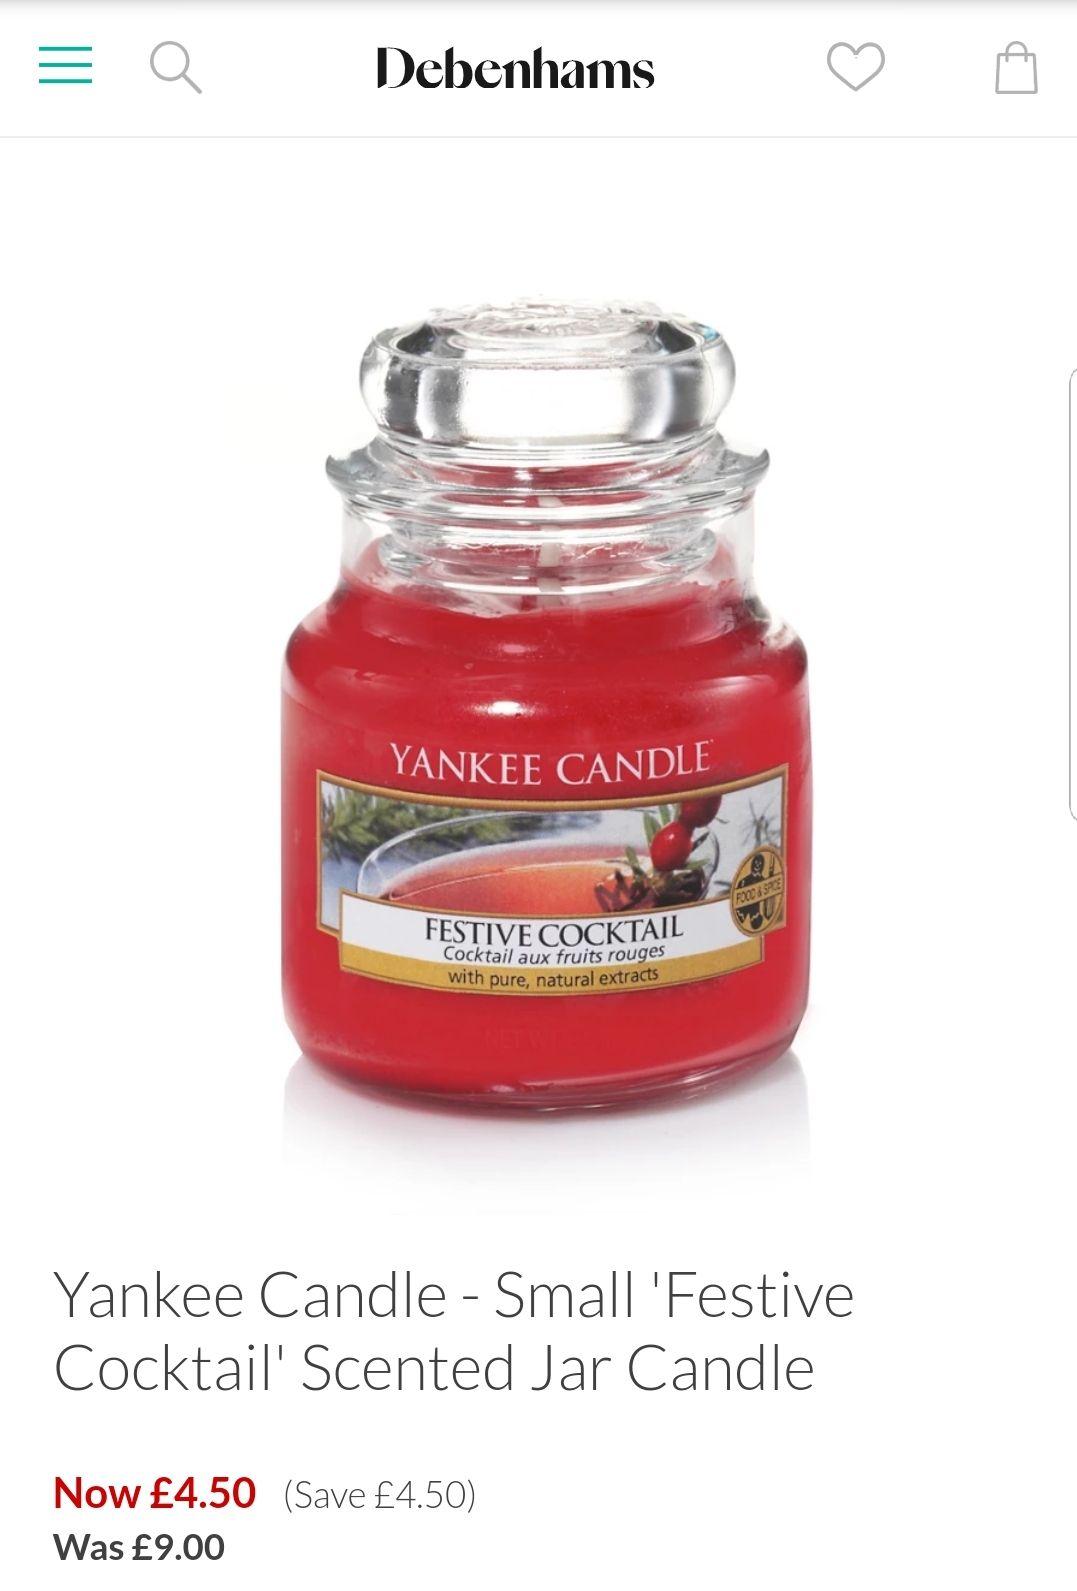 Small 'Festive Cocktail' Scented Jar Candle / Yankee Candle-Small 'Frosty Gingerbread' scented jar candle Debenhams £4.50 (free C&C)